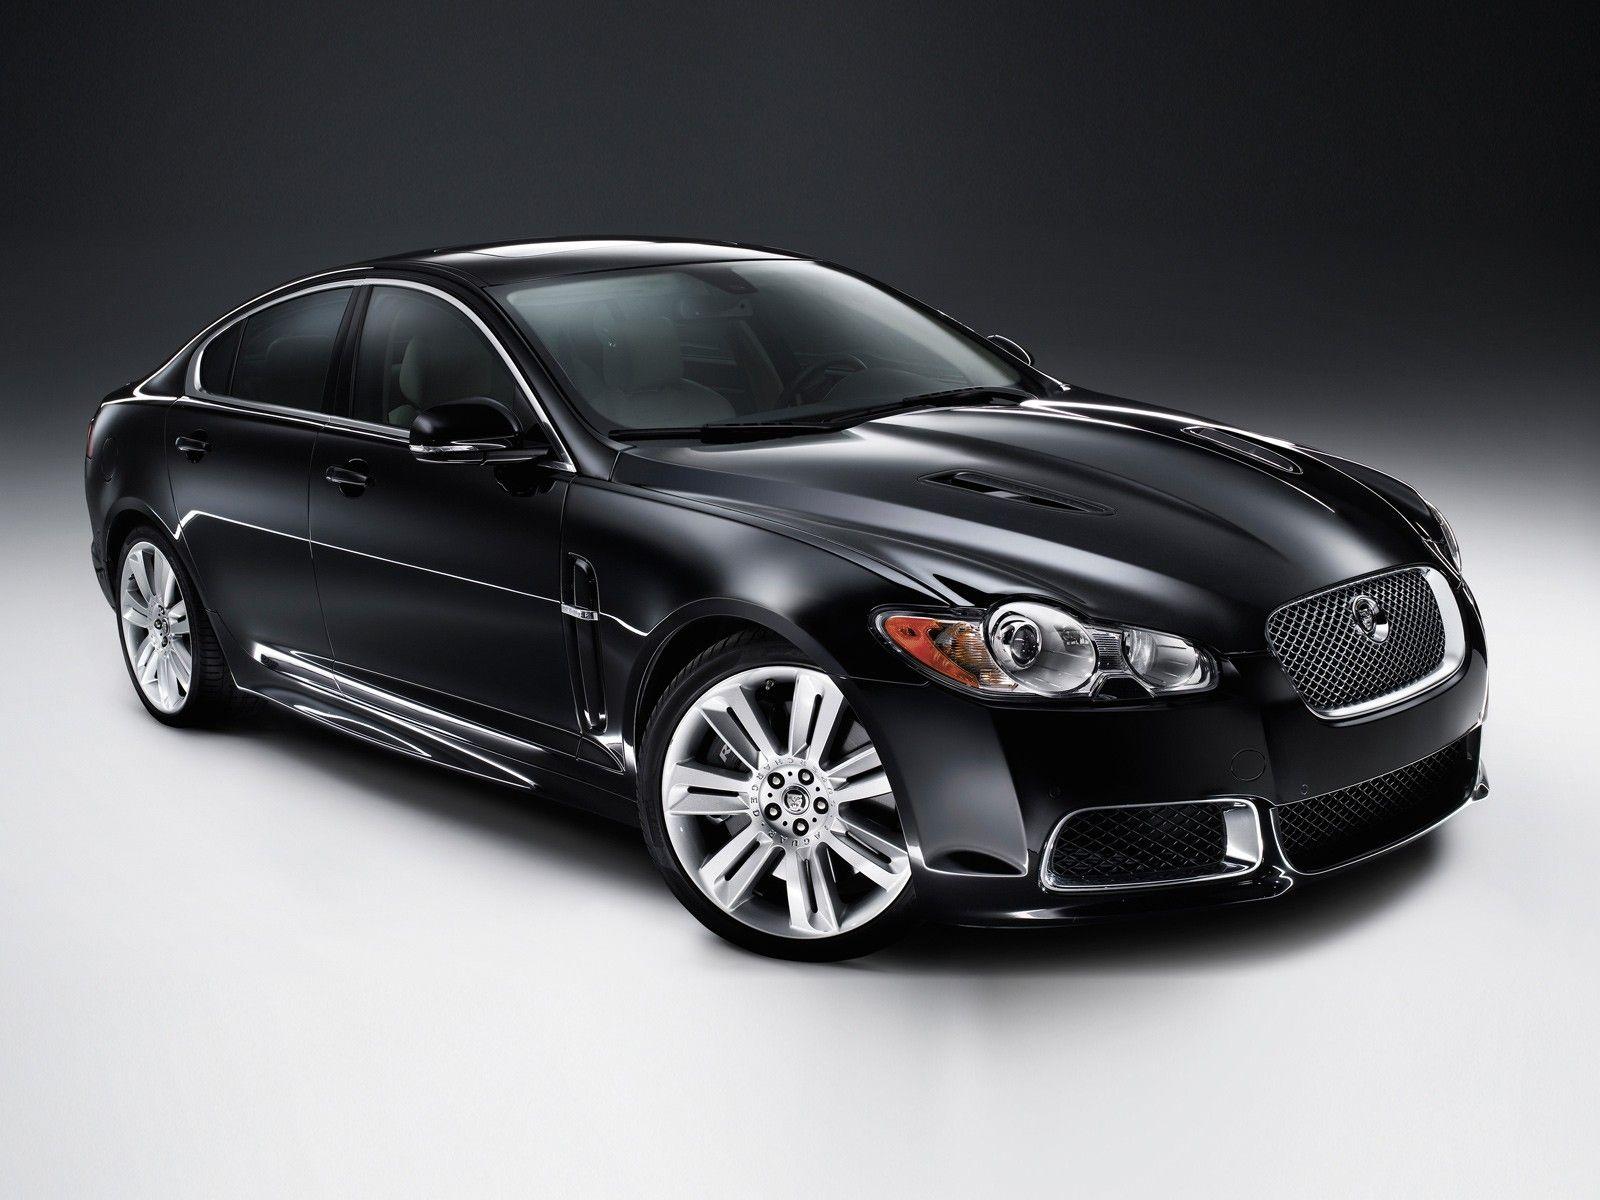 Jaguar Xfr Hd Images And Photos Black Jaguar Car Jaguar Xf Jaguar Car